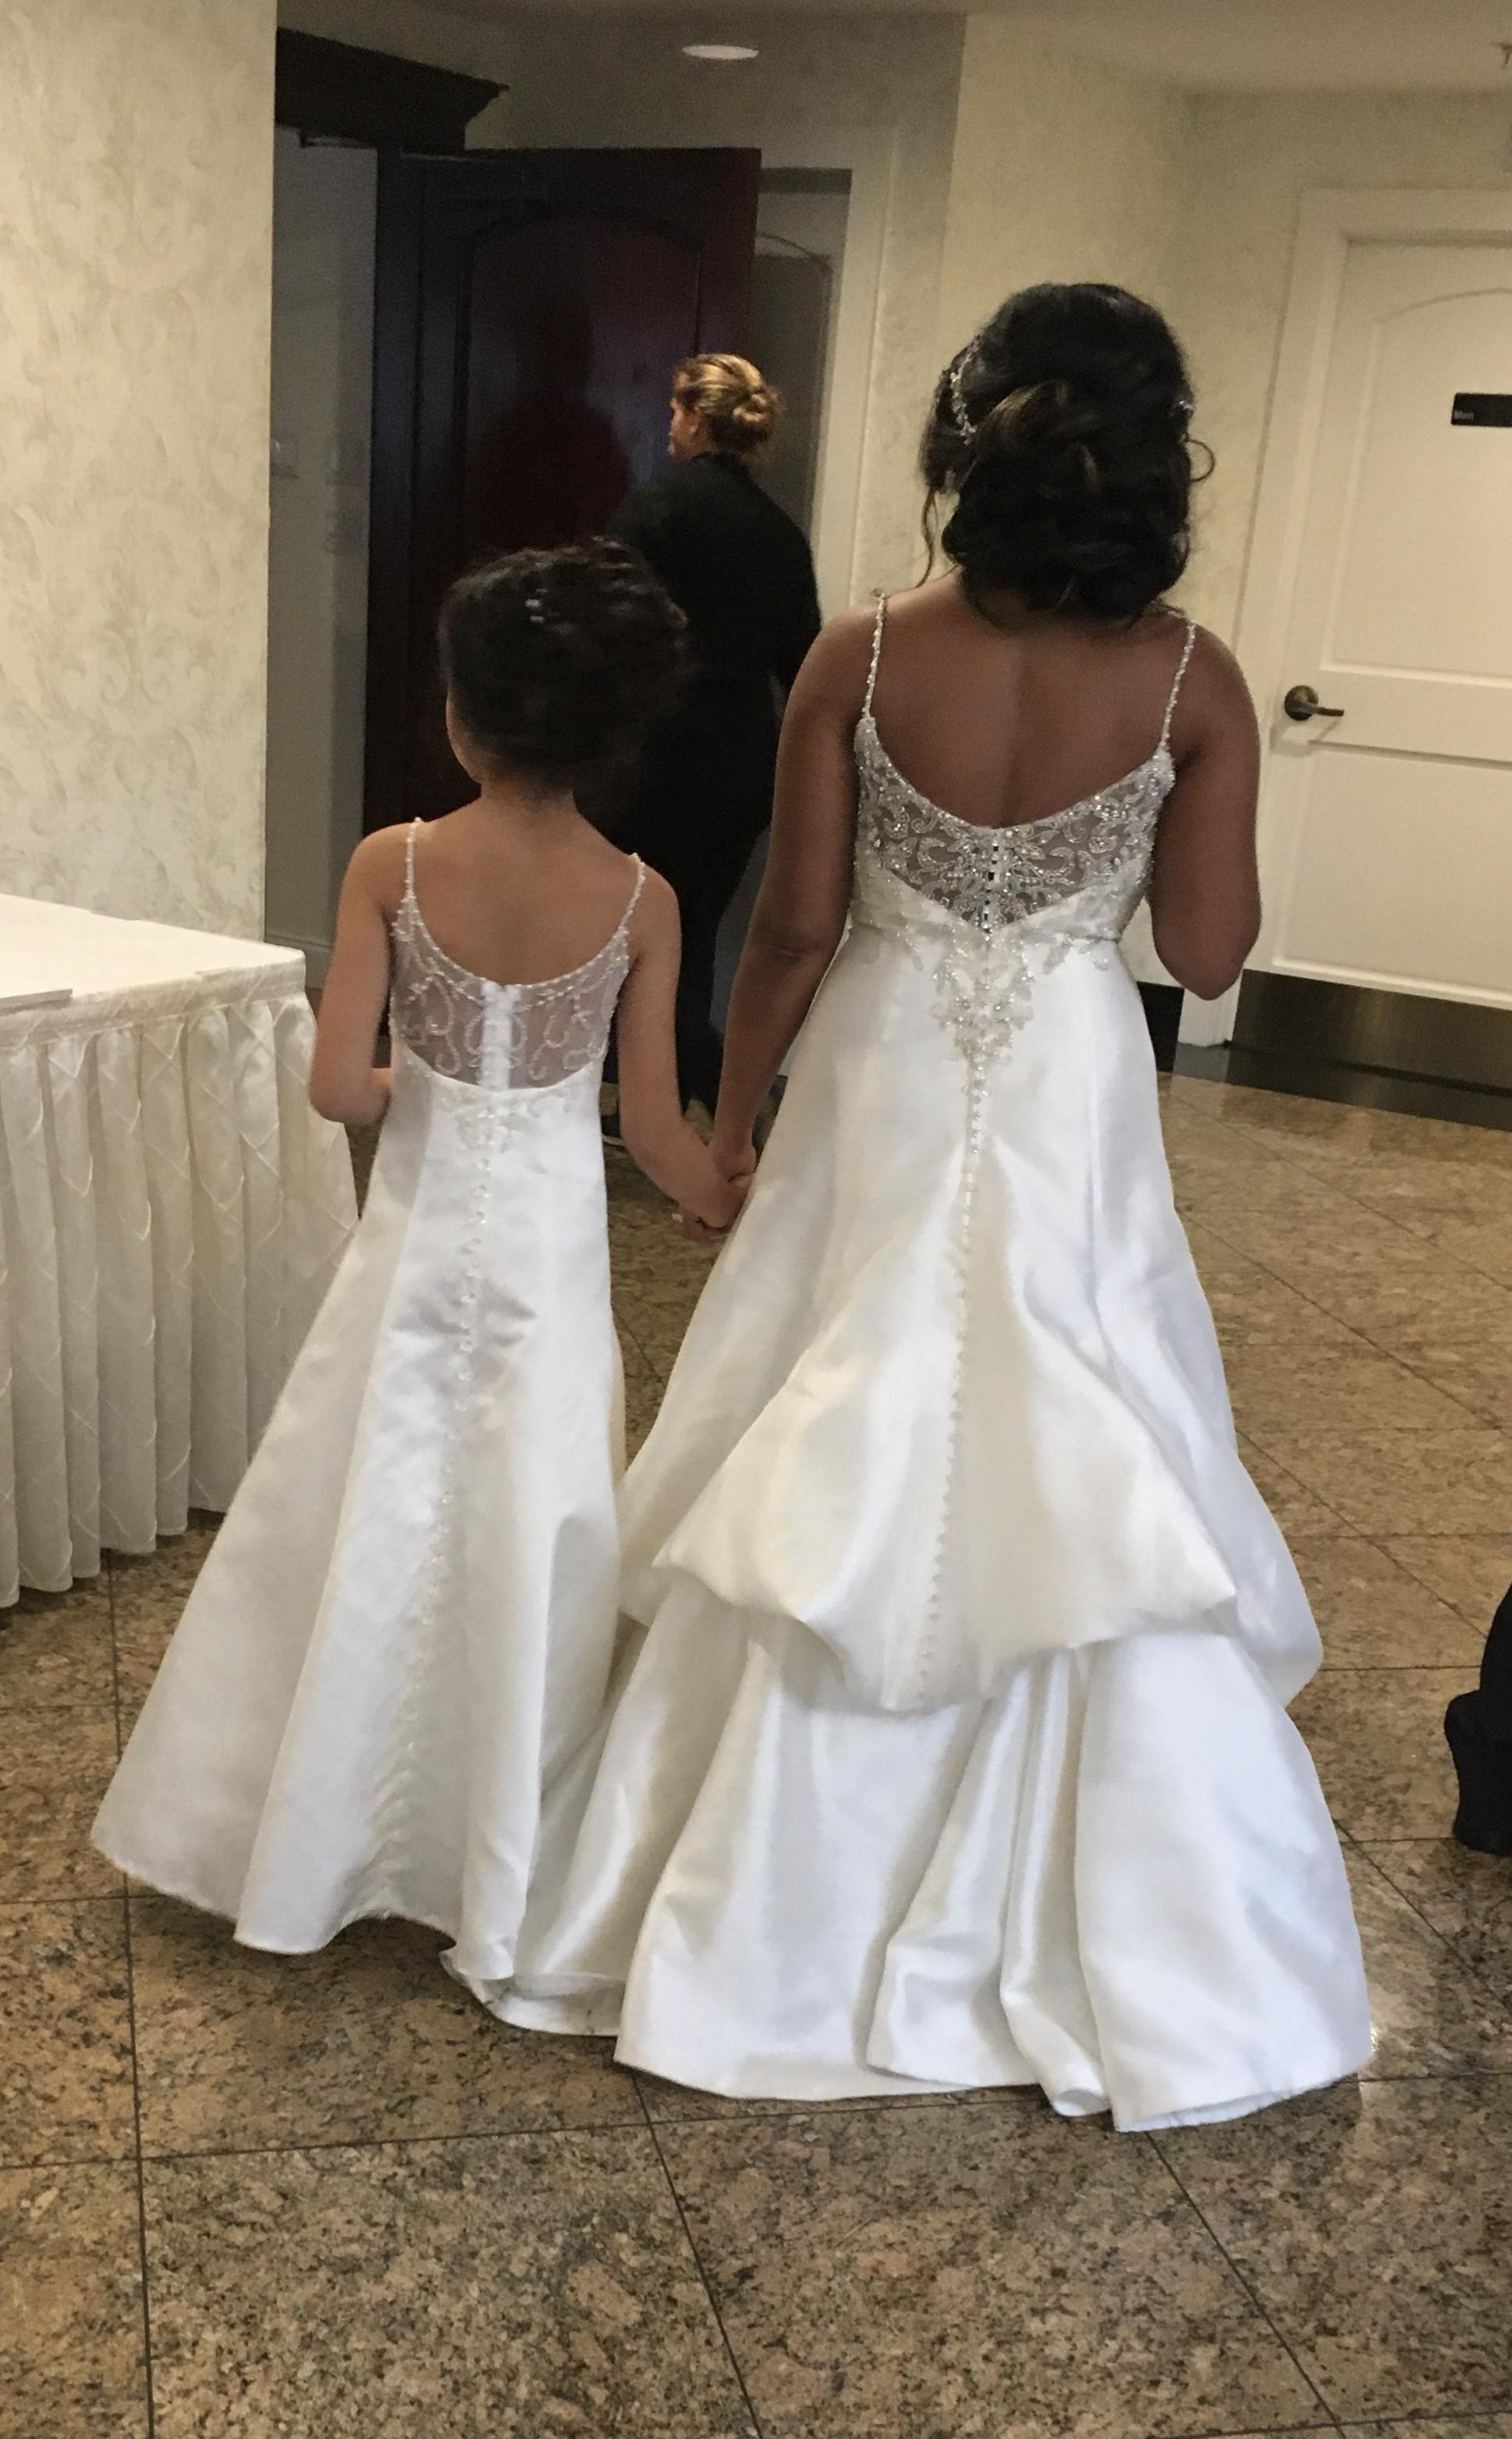 16a9c58d37e I would love for my daughter to have a matching flower girl dress. I have